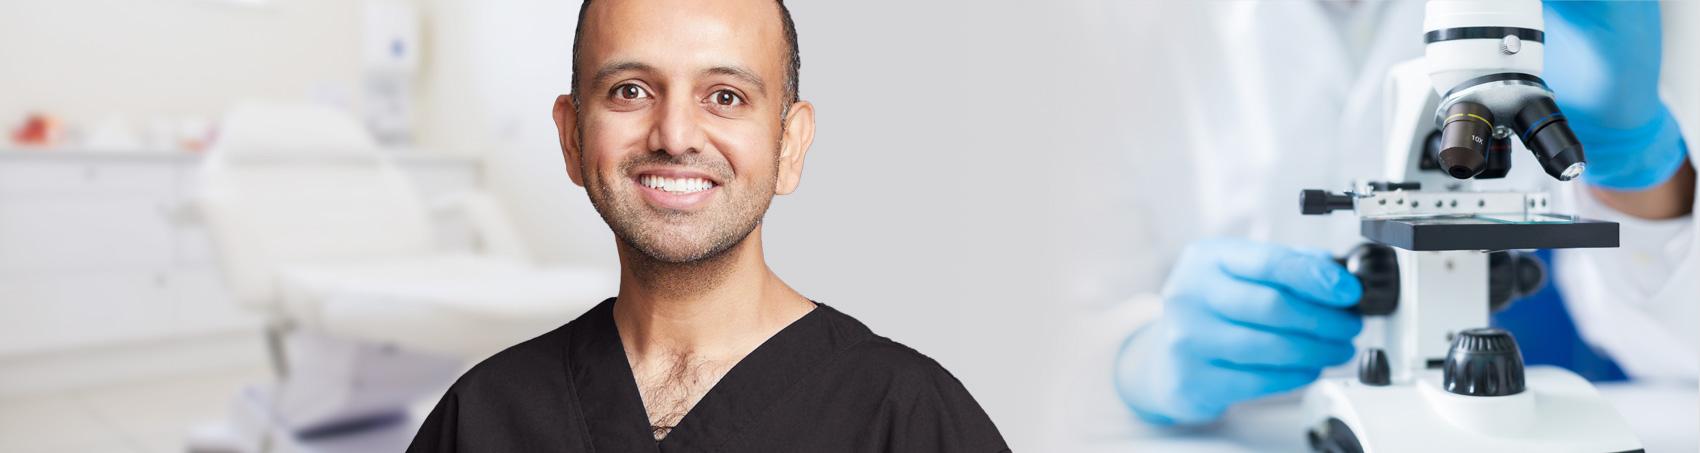 Dr-Arif-Aslam-Mohs-surgery-Lancashire